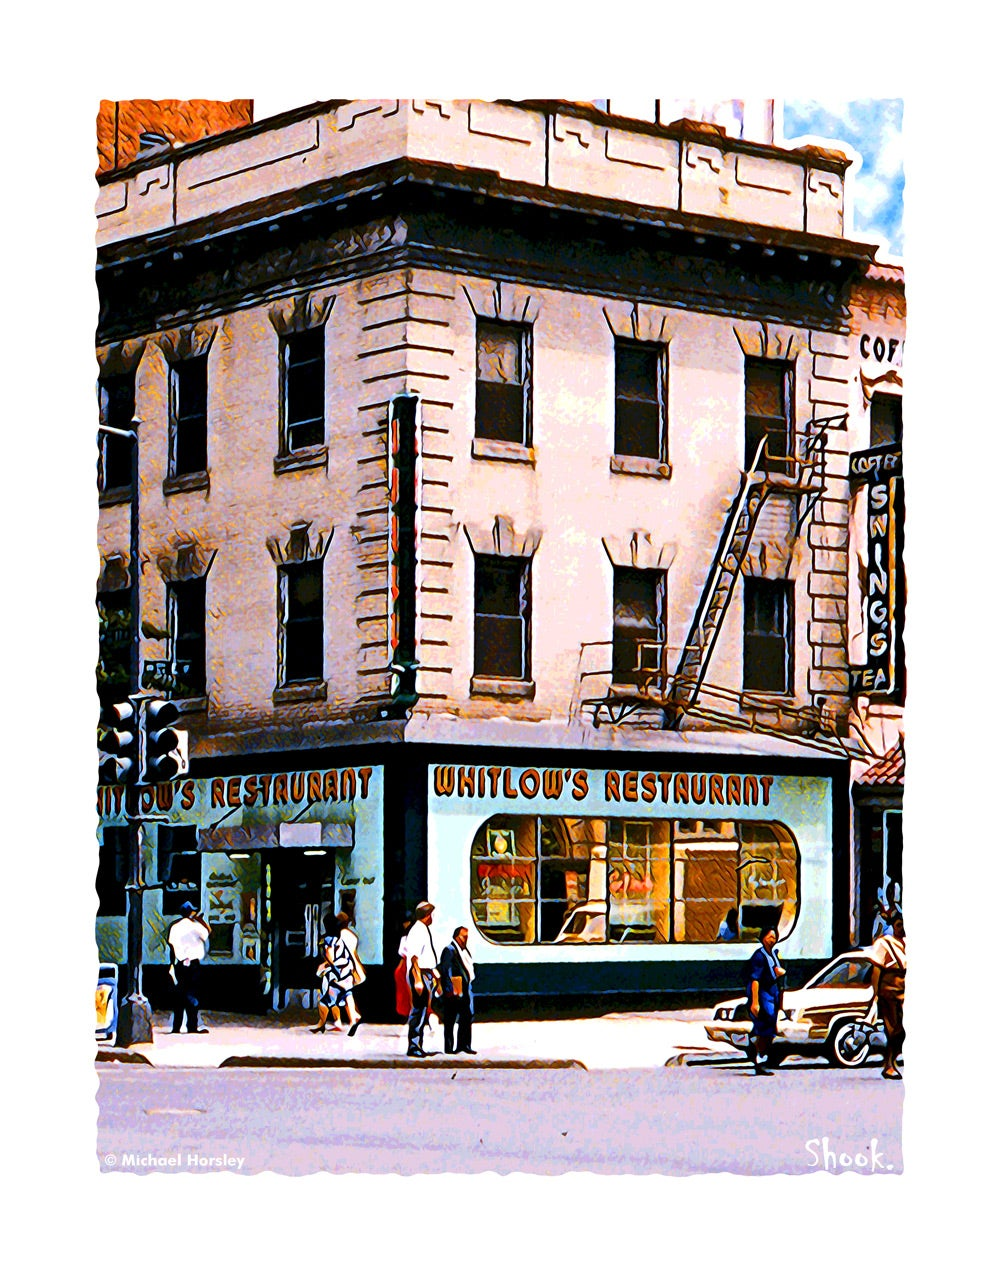 Whitlow's Restaurant, Washington DC Giclée Art Print (Multi-size options)